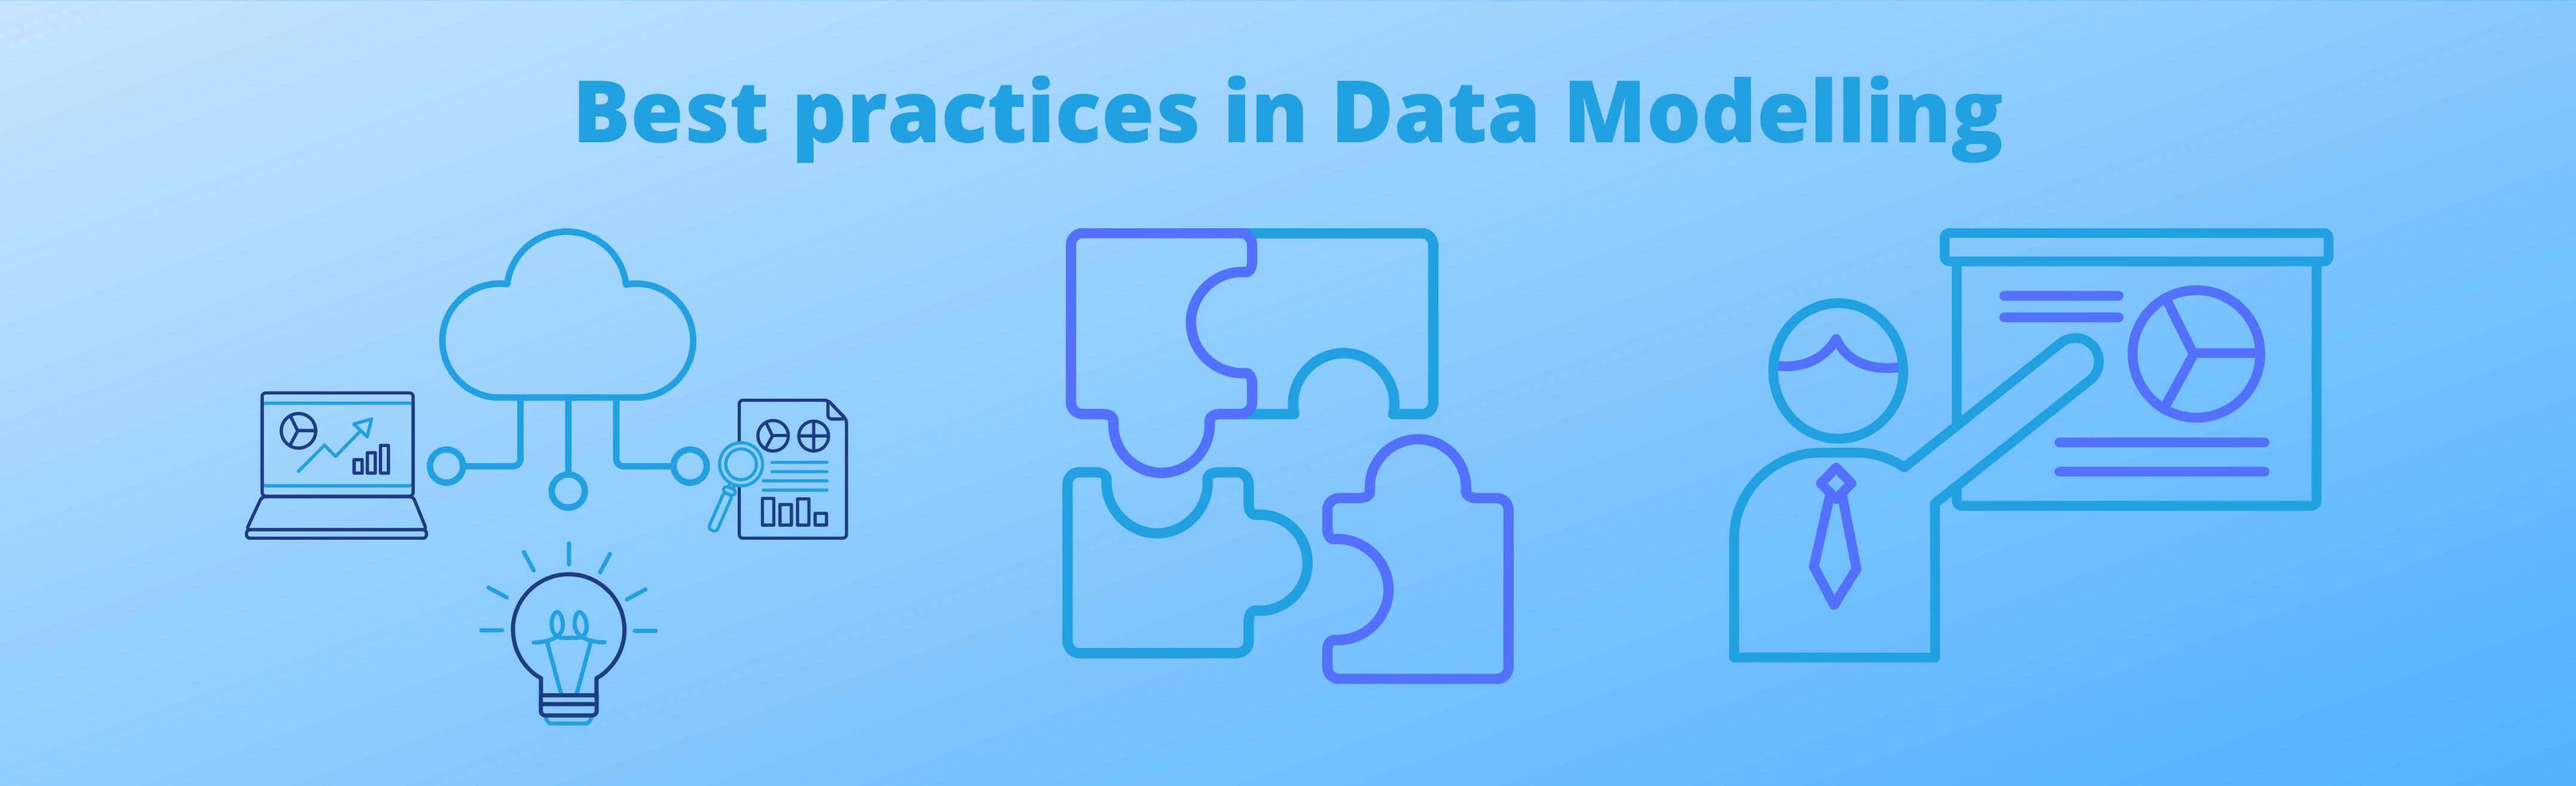 Data modeling best practices